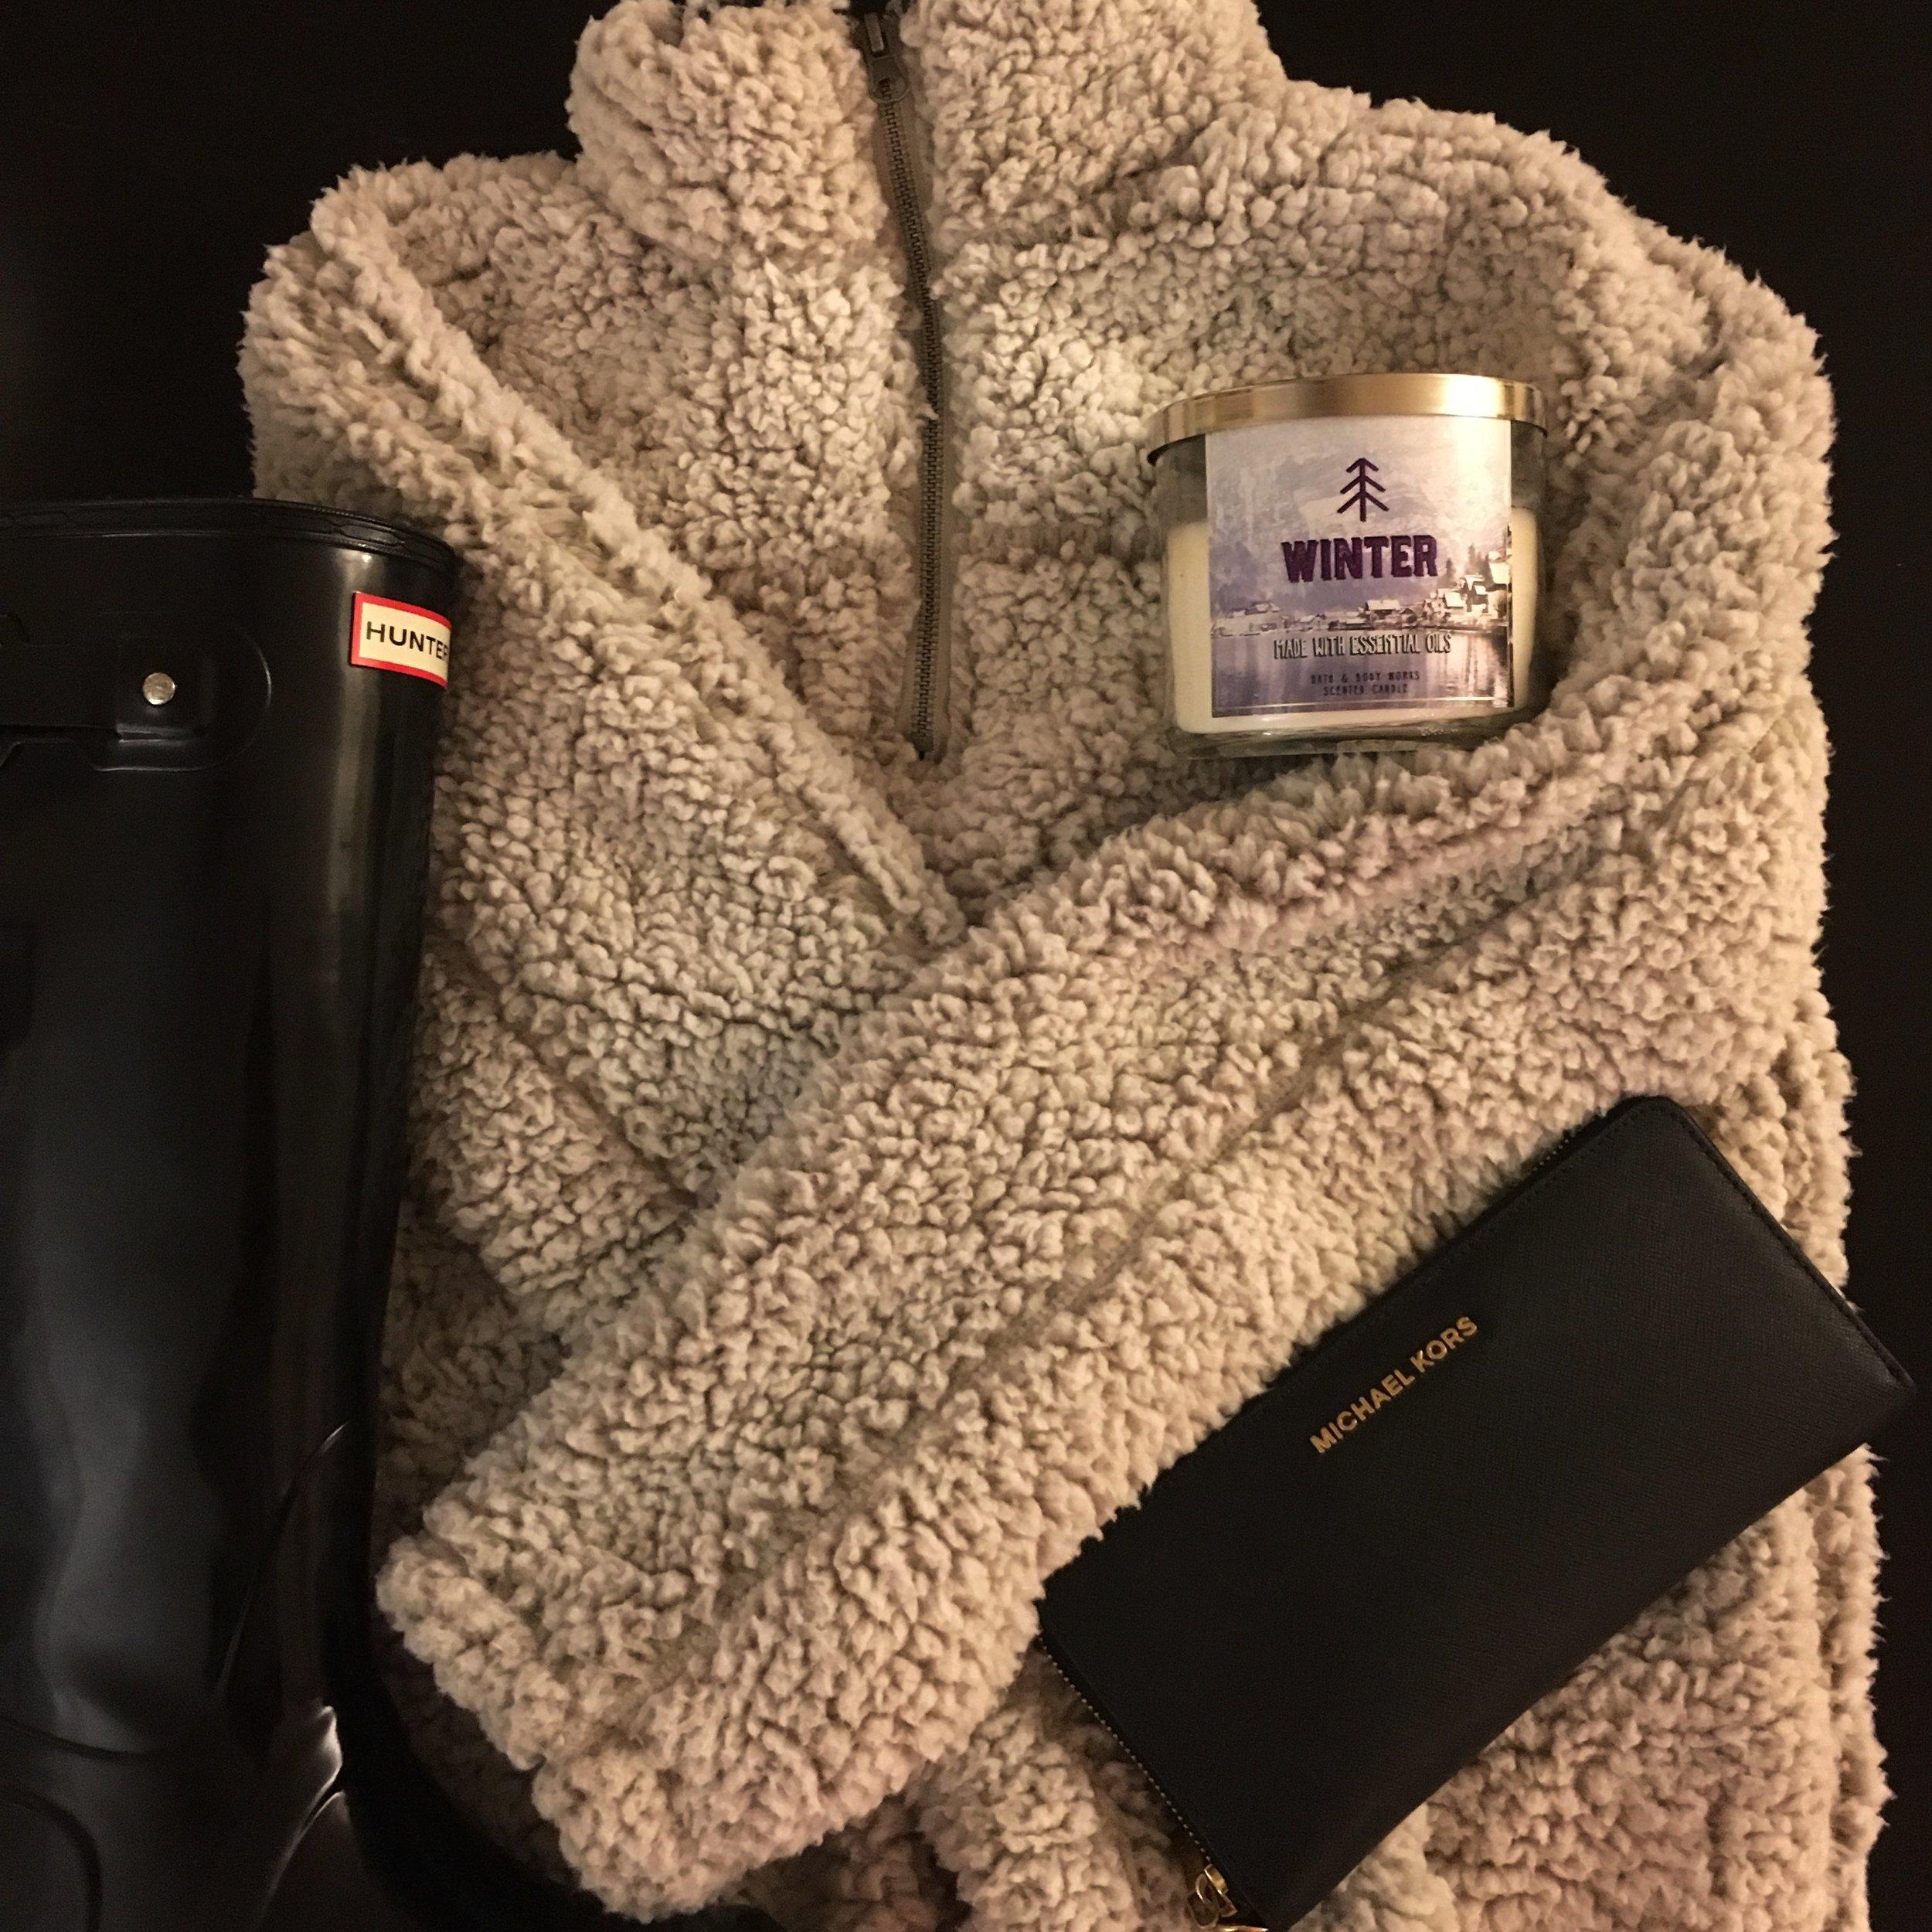 Hunter Boots,   Fleece Pullover ,  Michael Kors Wallet